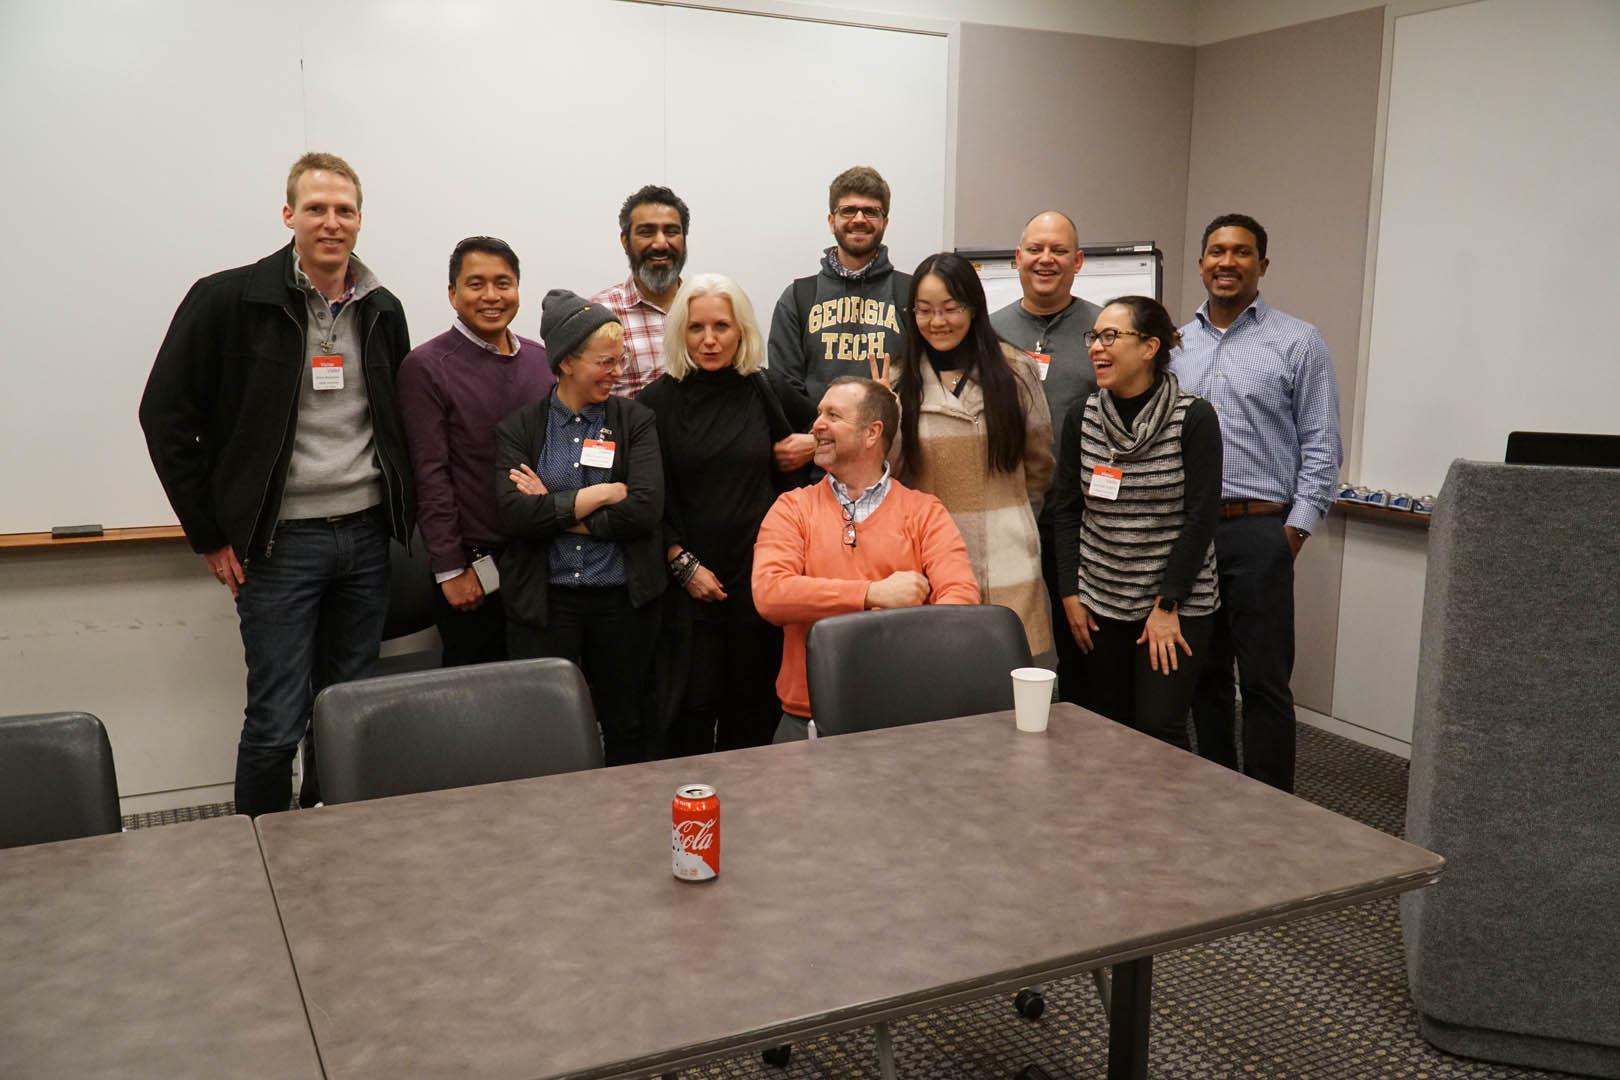 Steve Moubray hosting the Agile UX Team